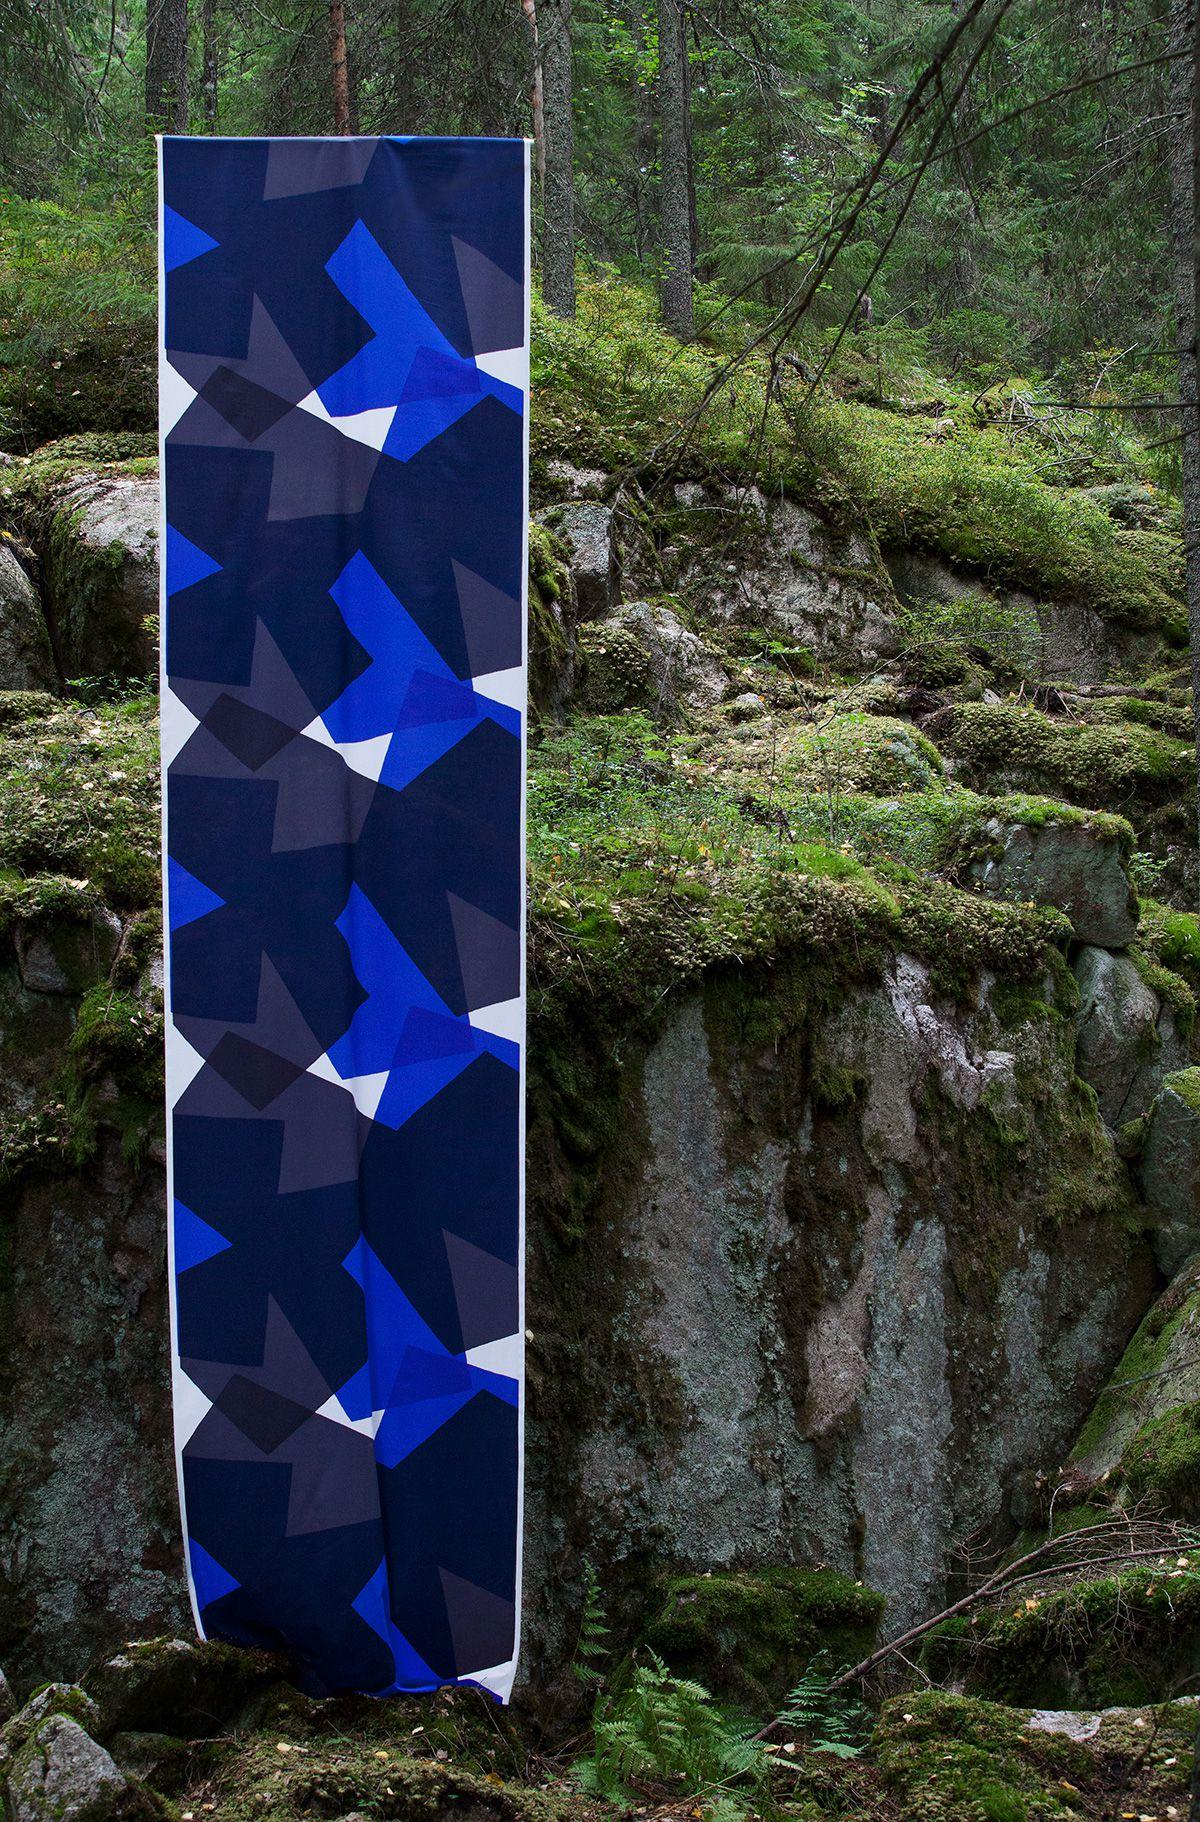 OTTAIPNU オリジナルファブリック『arare』スクリーンプリント2018大きな柄が好きなのもやはり、北欧のプリント生地の影響と語る。